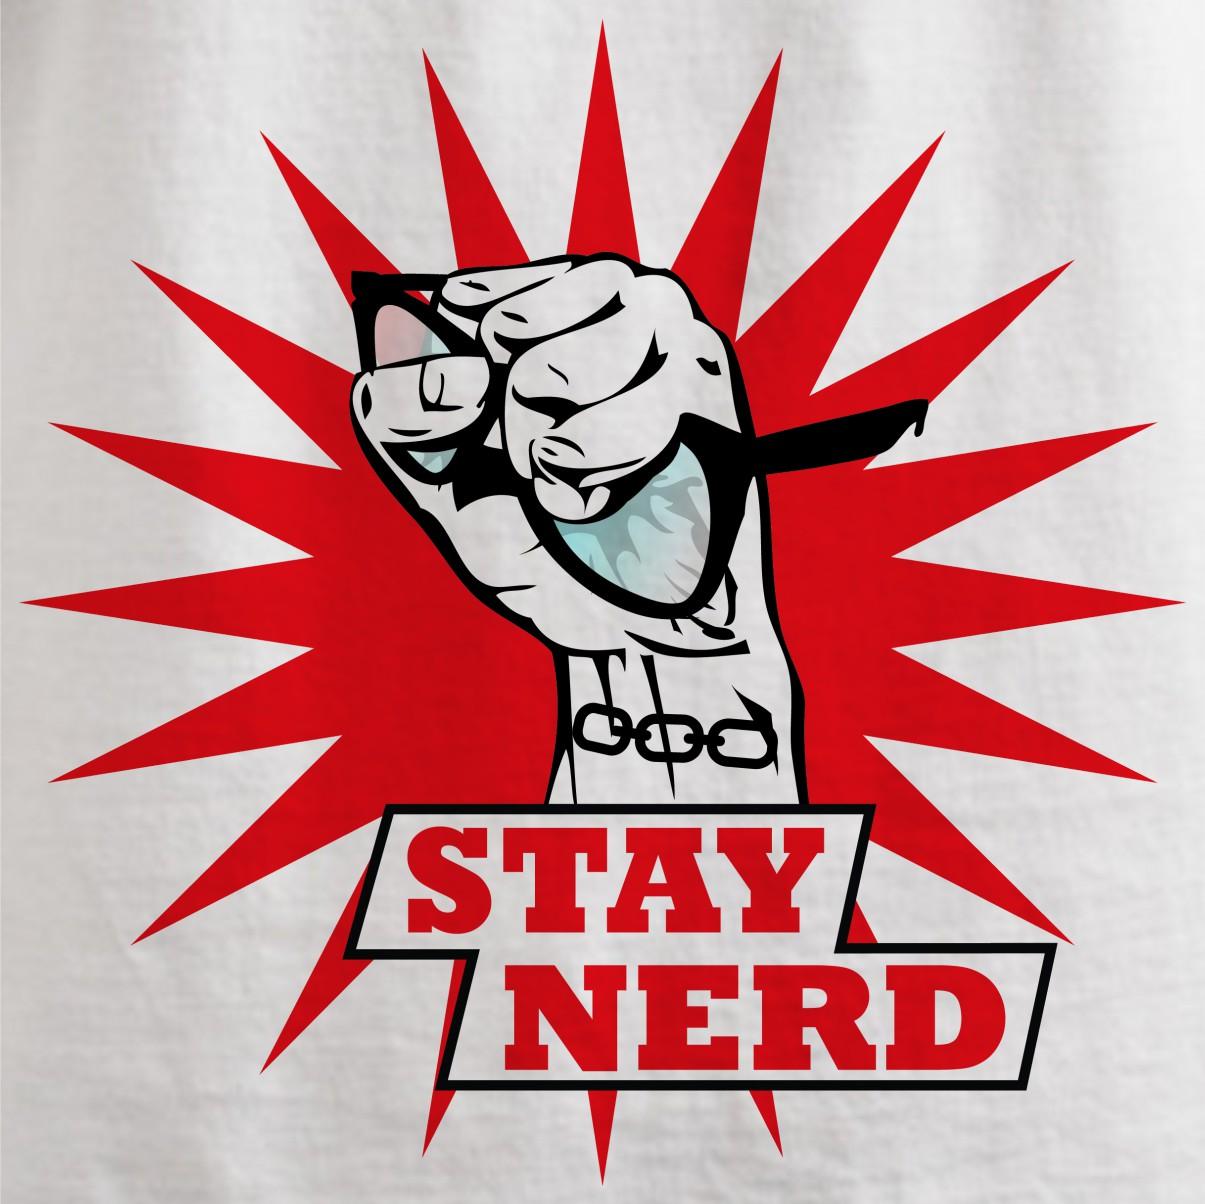 STAY NERD